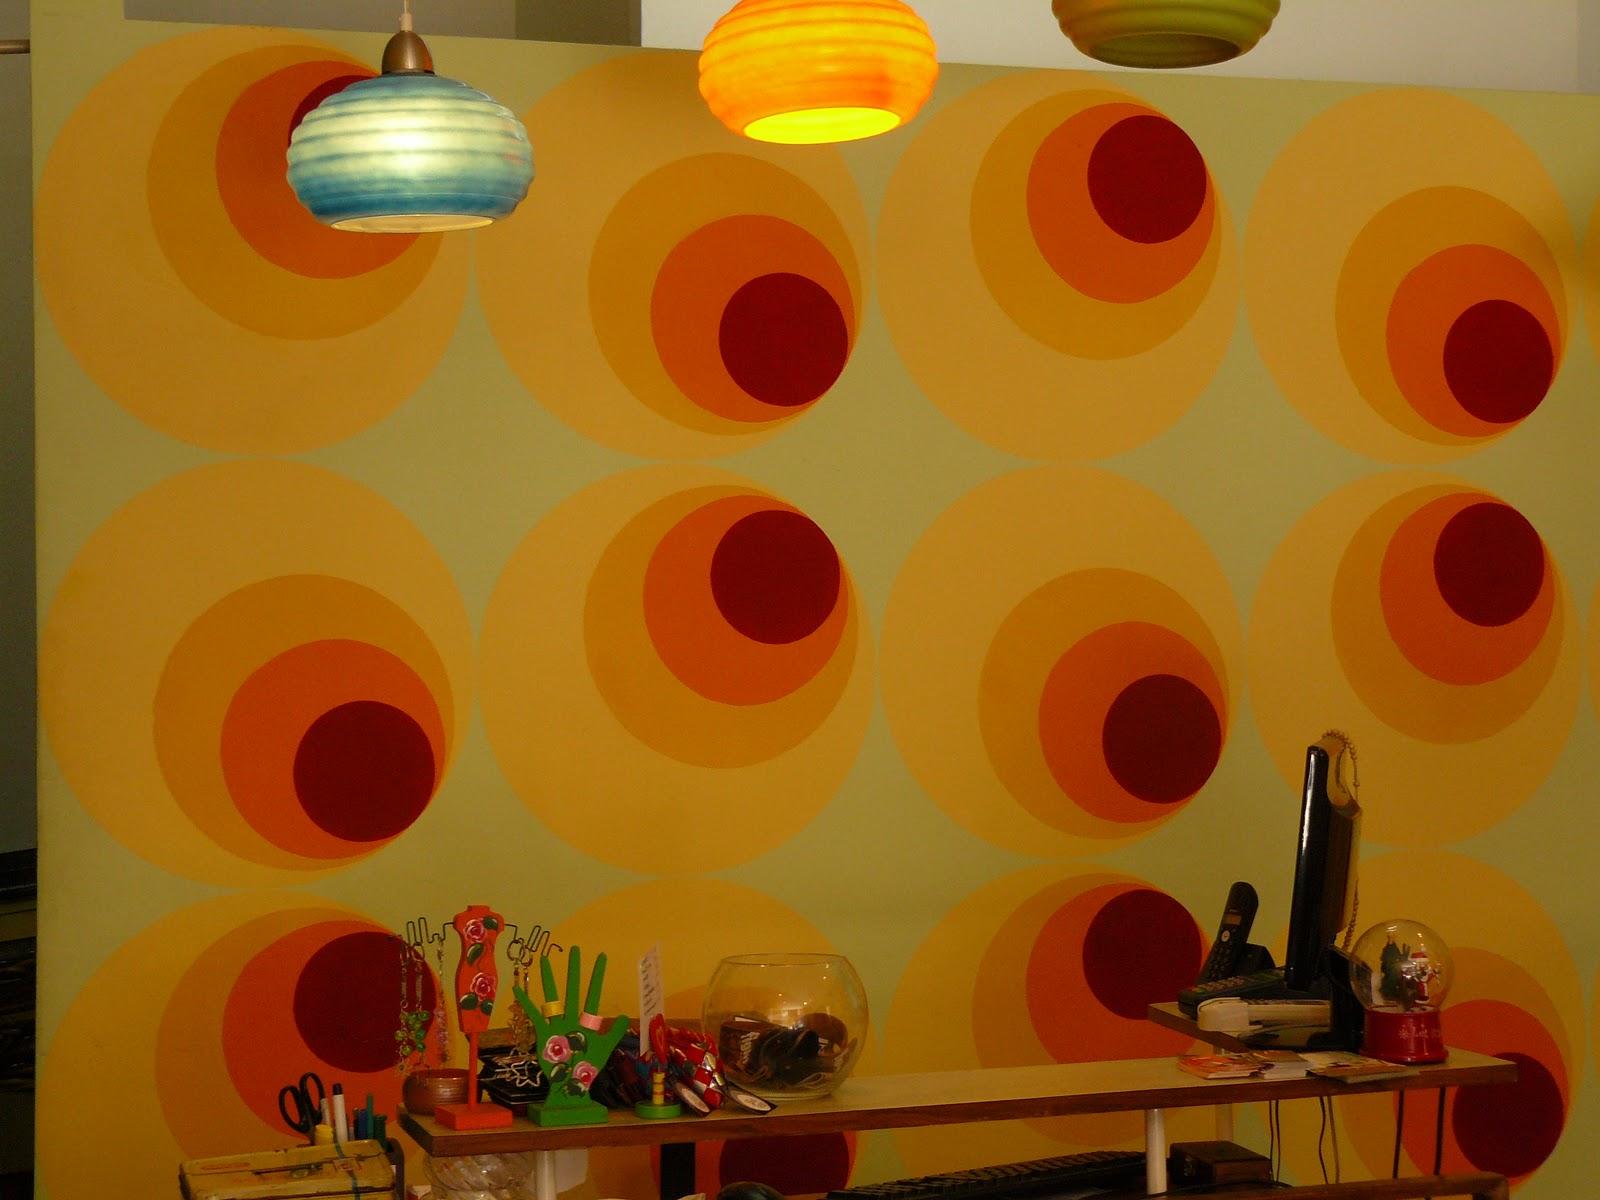 Elensamble pintura art stica sobre paredes for Paredes artisticas